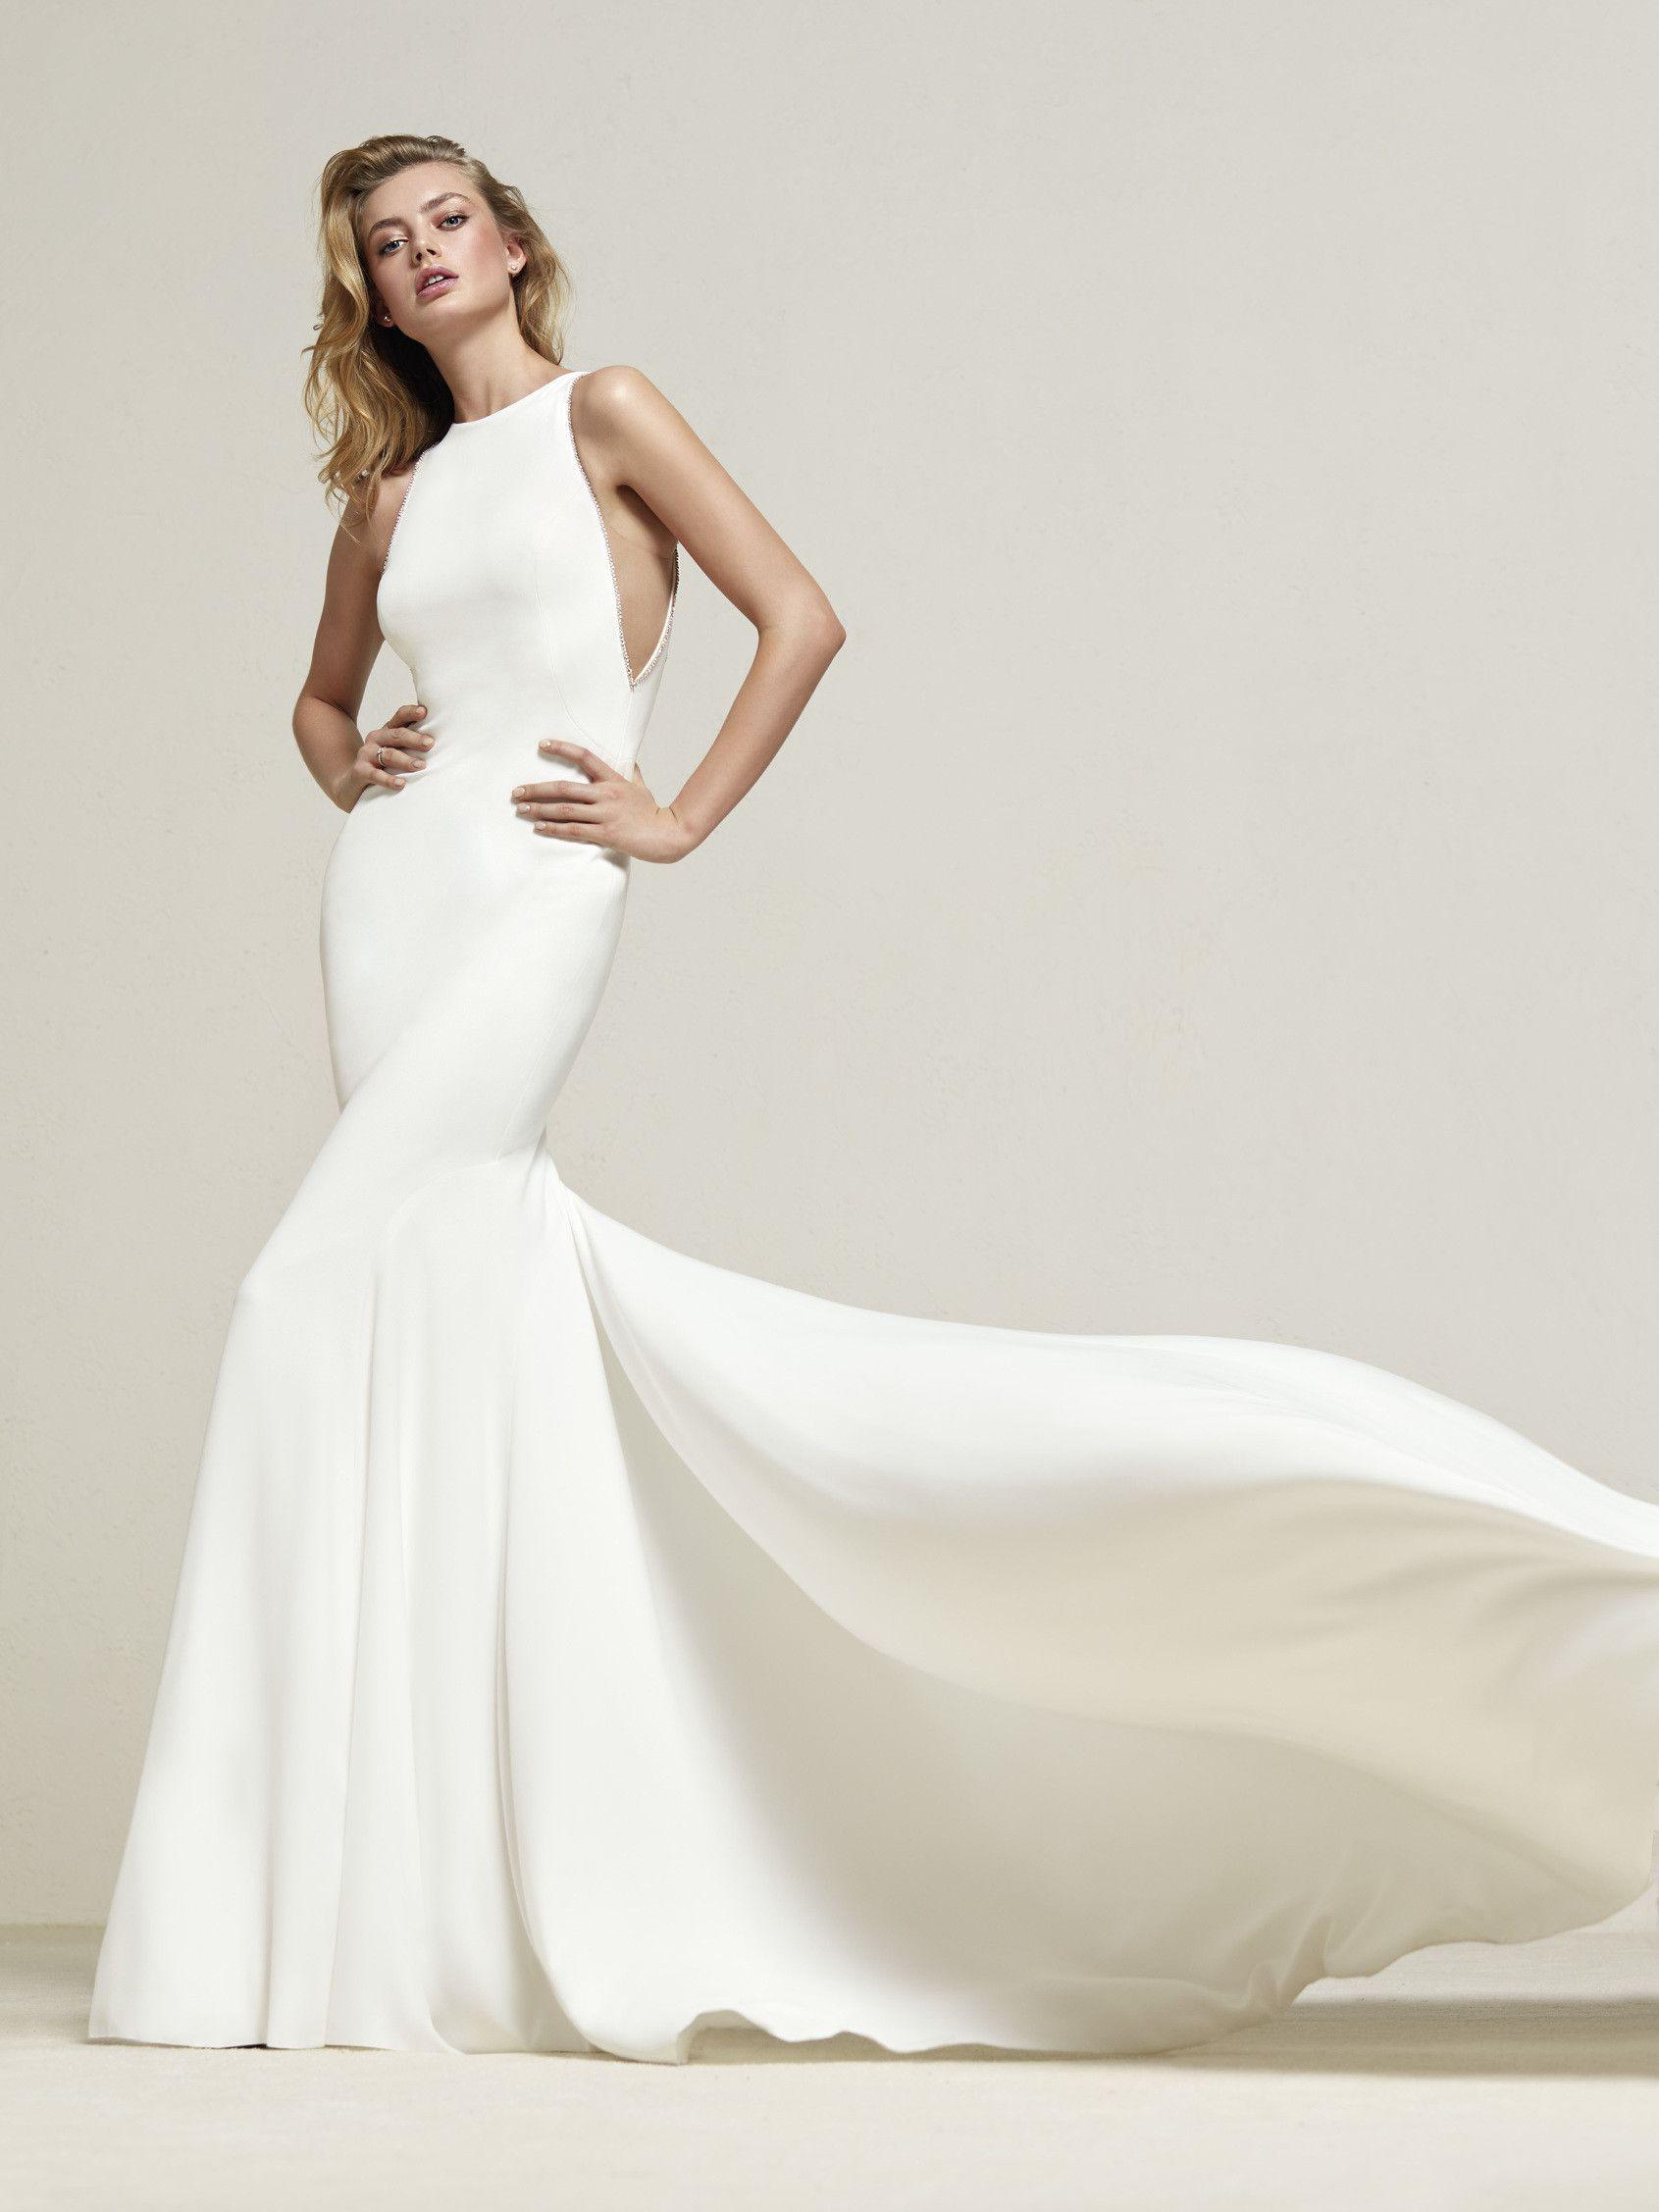 Mermaid dress wedding  Driosa Mermaid wedding dress with large train in crepe and tulle